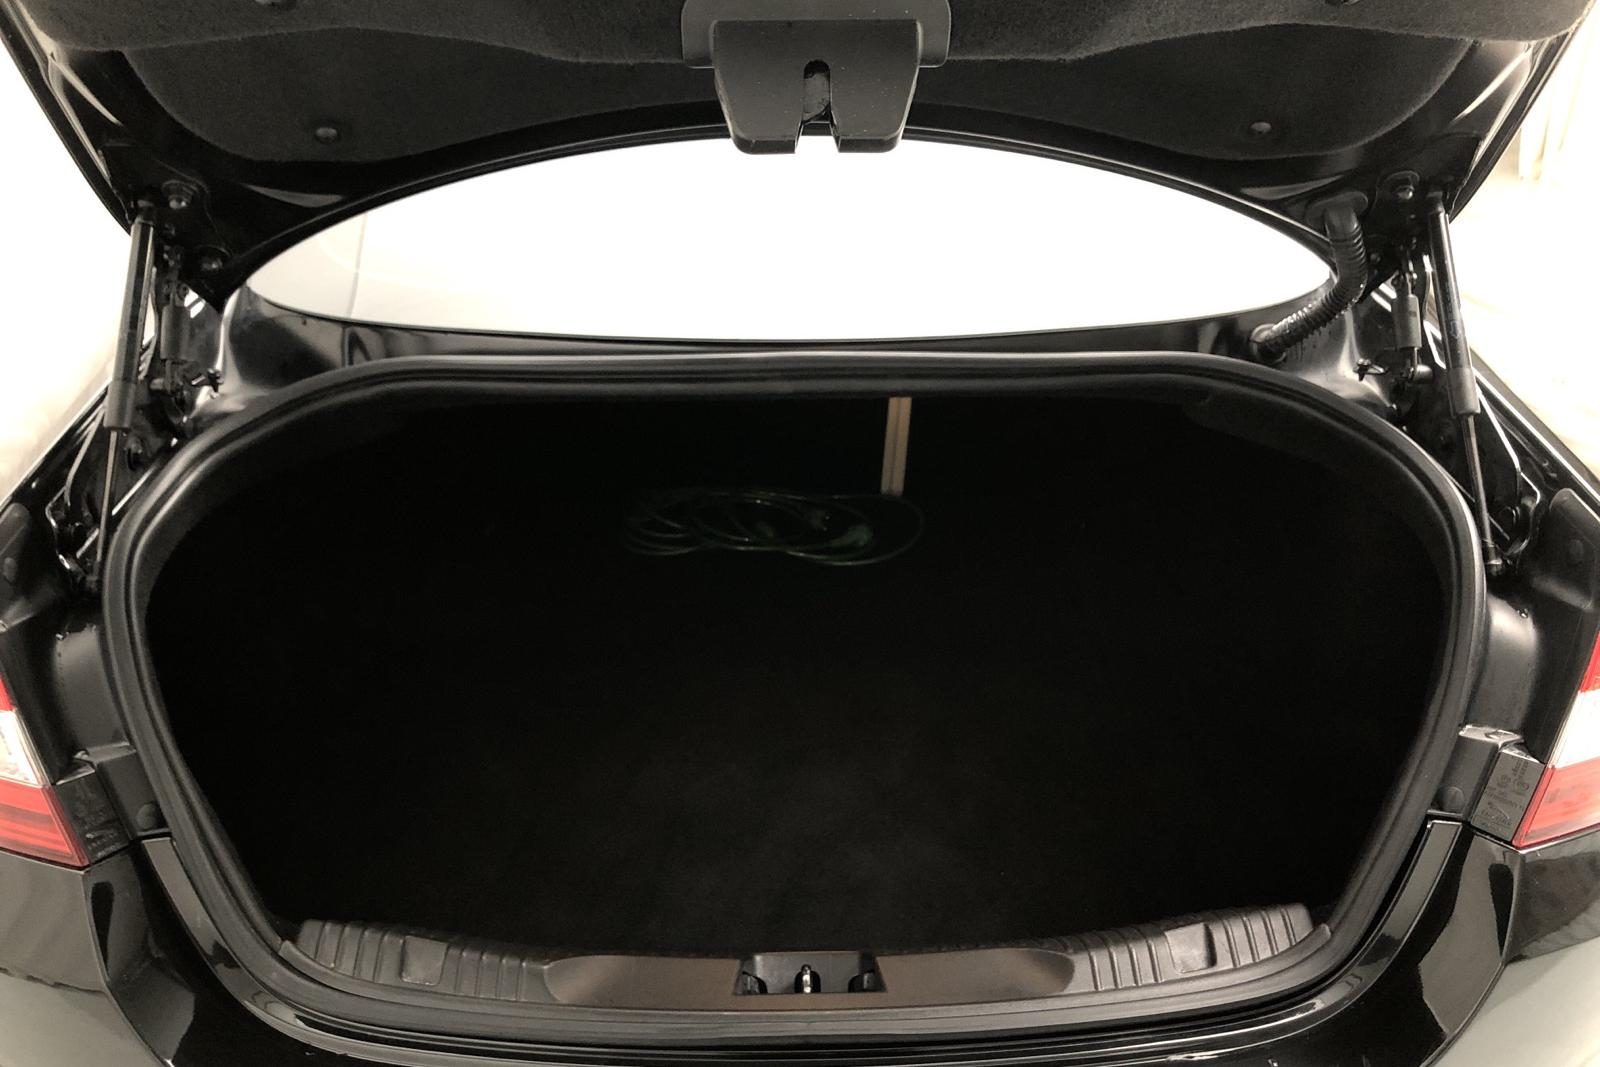 Jaguar XF 3.0 DS (275hk) - 6 548 mil - Automat - svart - 2014